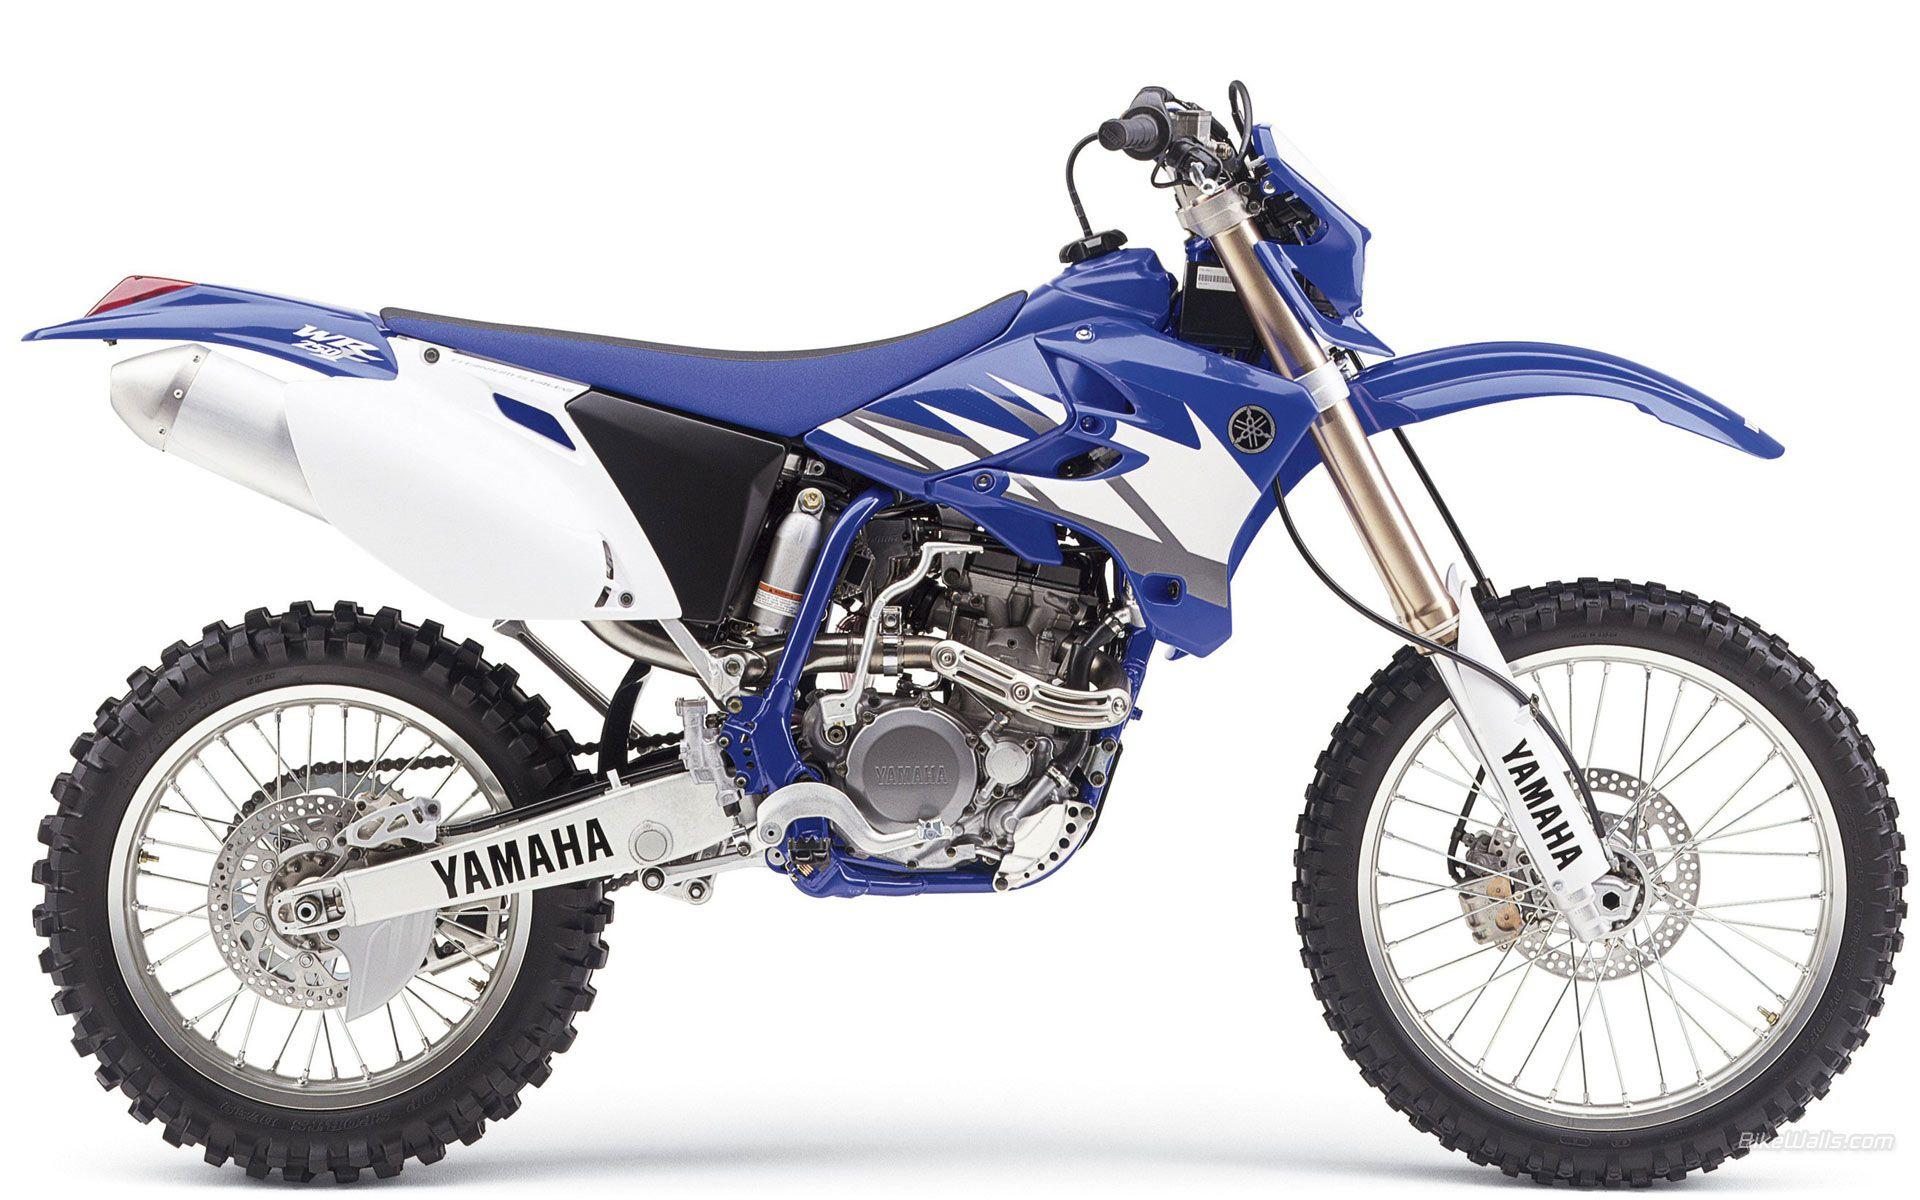 Yamaha Wr 250 F Motocroos Motocros Motocicletas